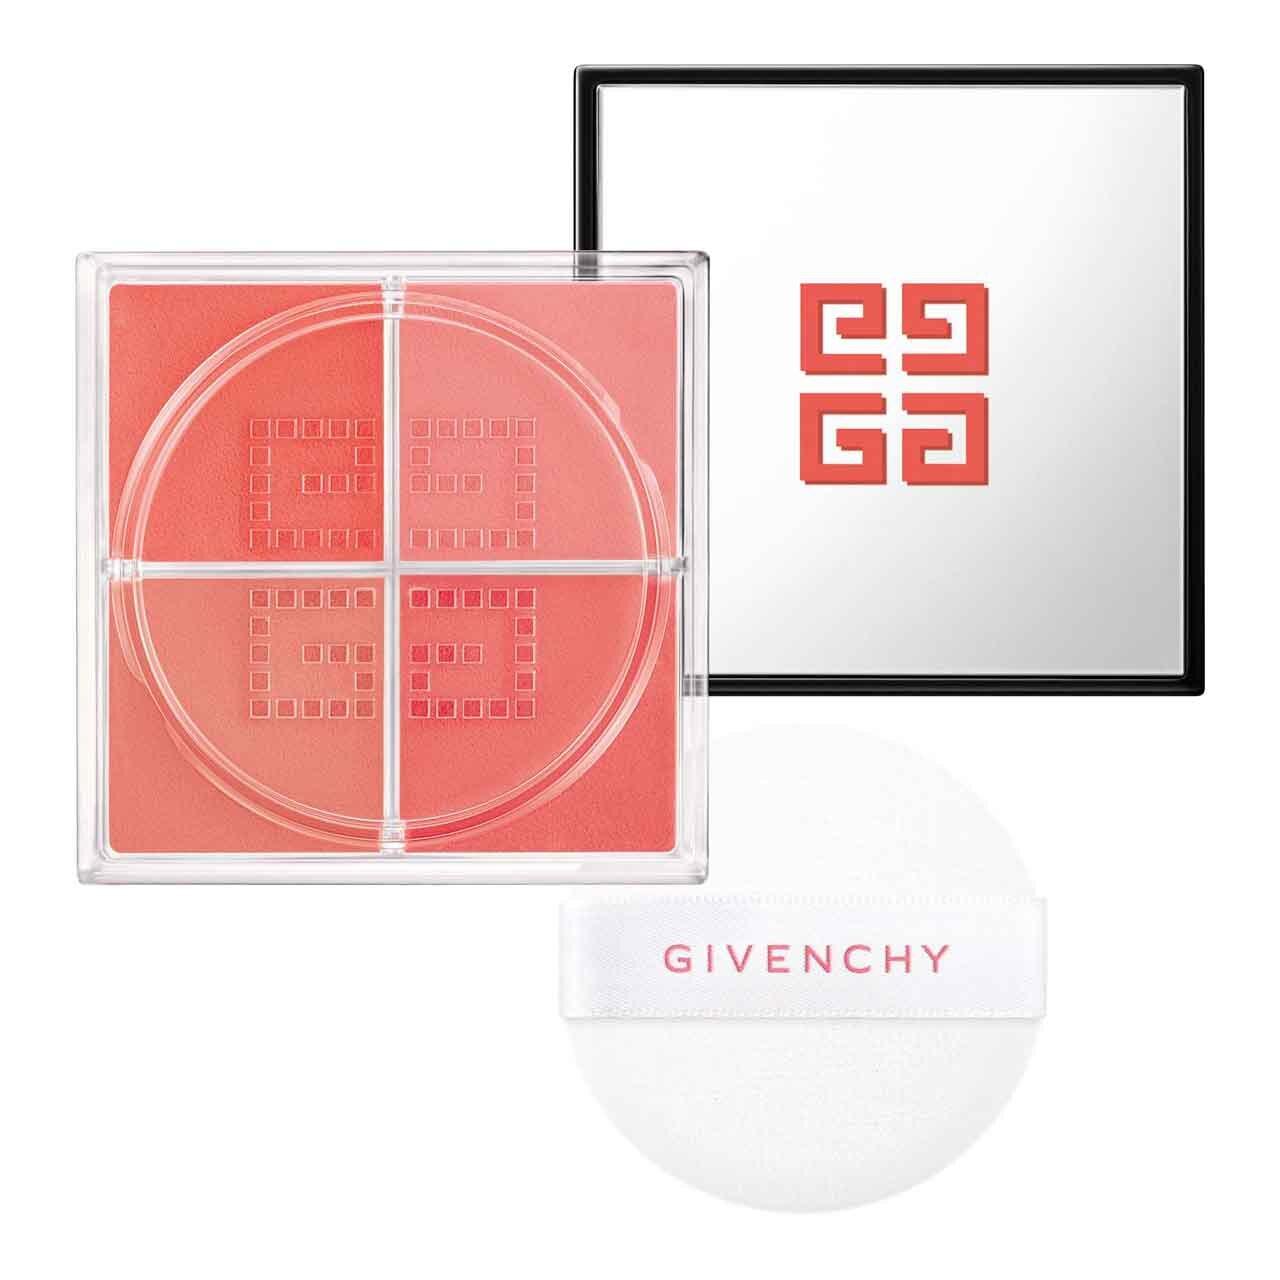 GIVENCHY/ジバンシイ「プリズム・リーブル・ブラッシュ No.3」